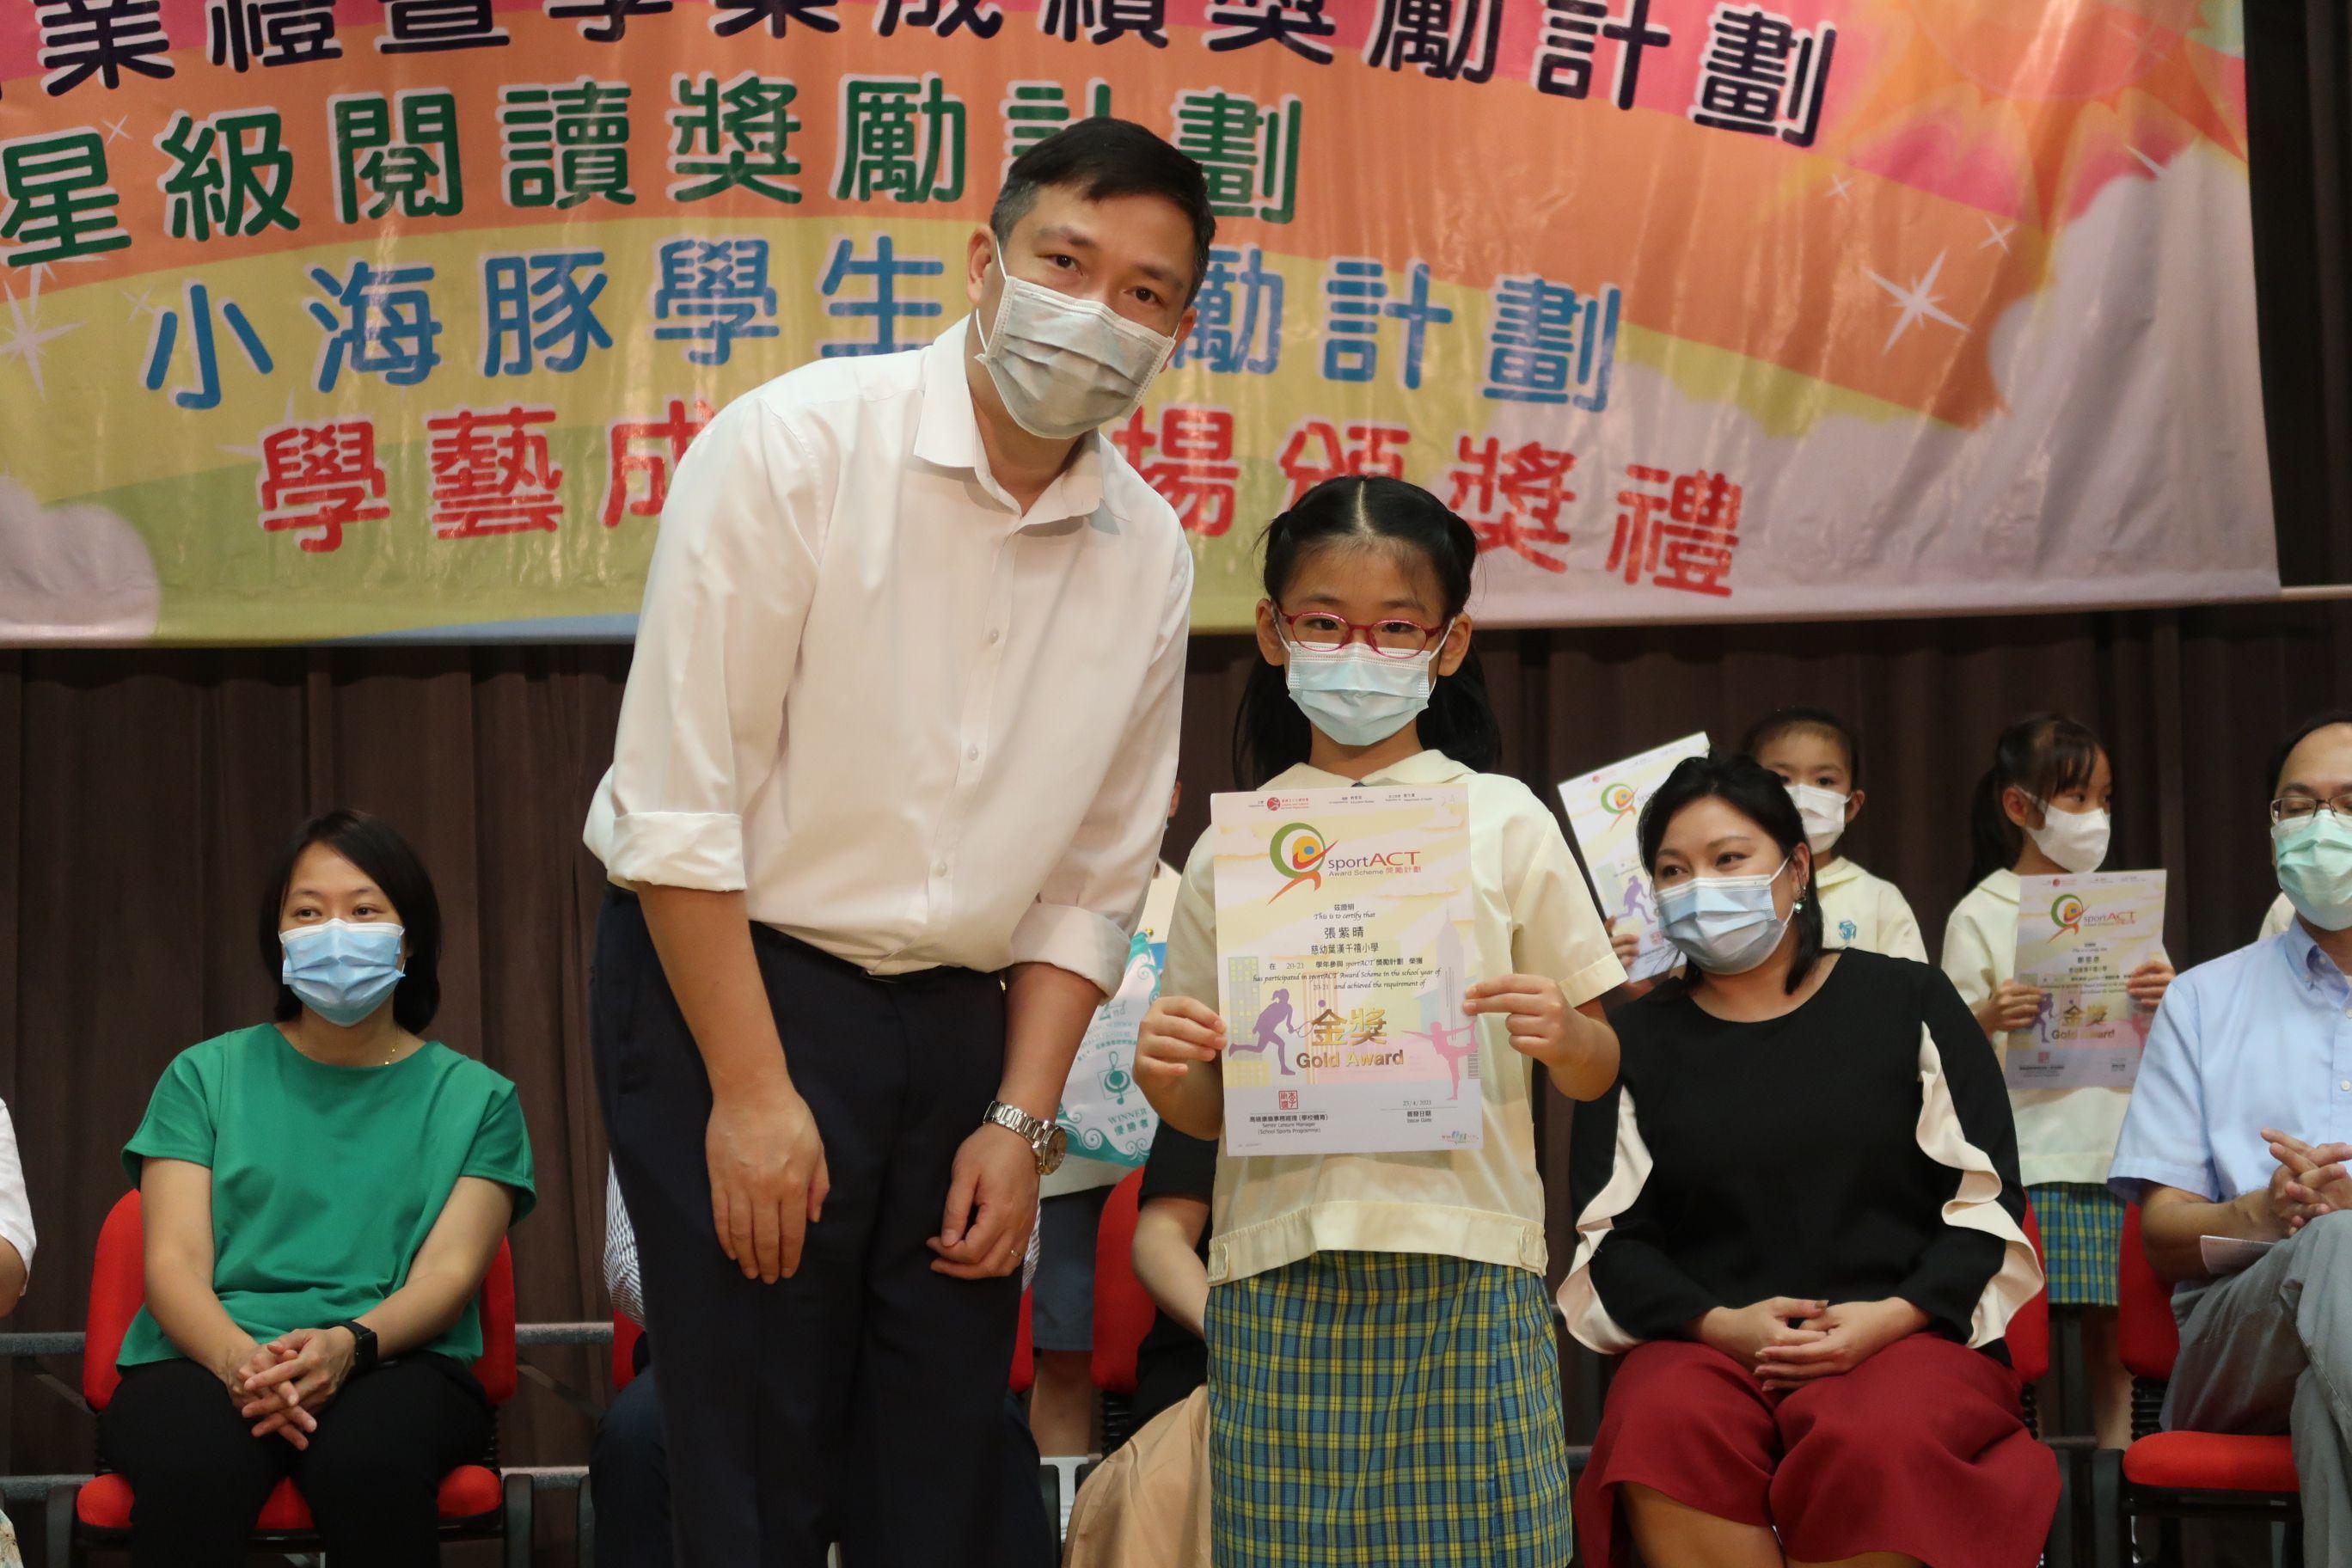 https://syh.edu.hk/sites/default/files/img_5898.jpg